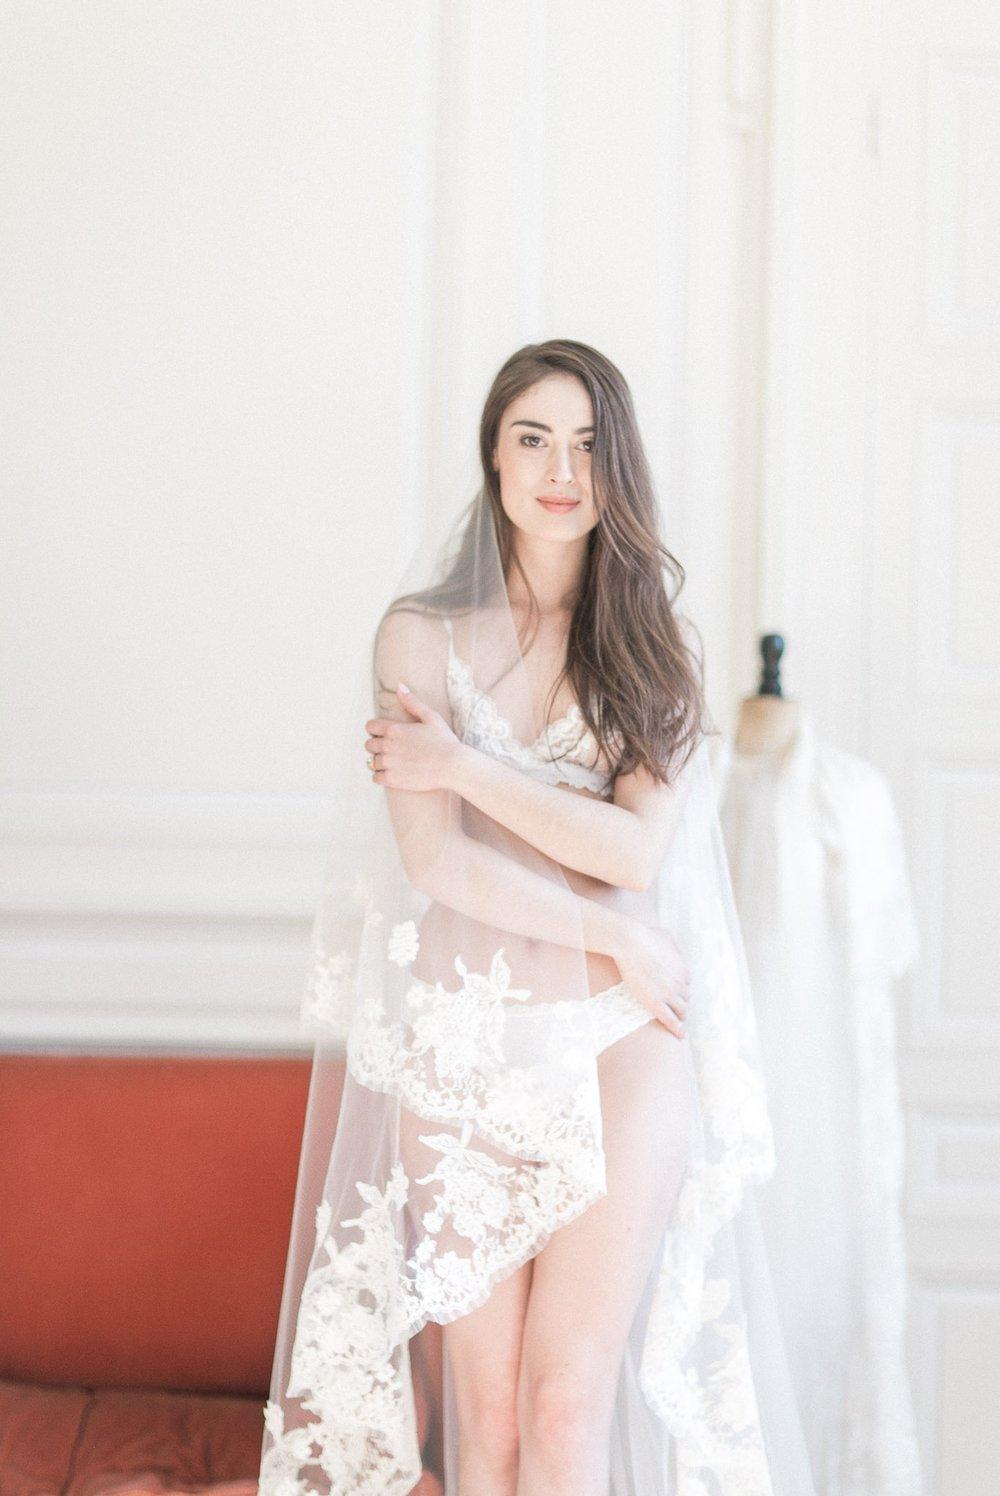 boudoir-collective-fine-art-boudoir-magazine-and-blog-christina-piombetti-photography-french-boudoir-1